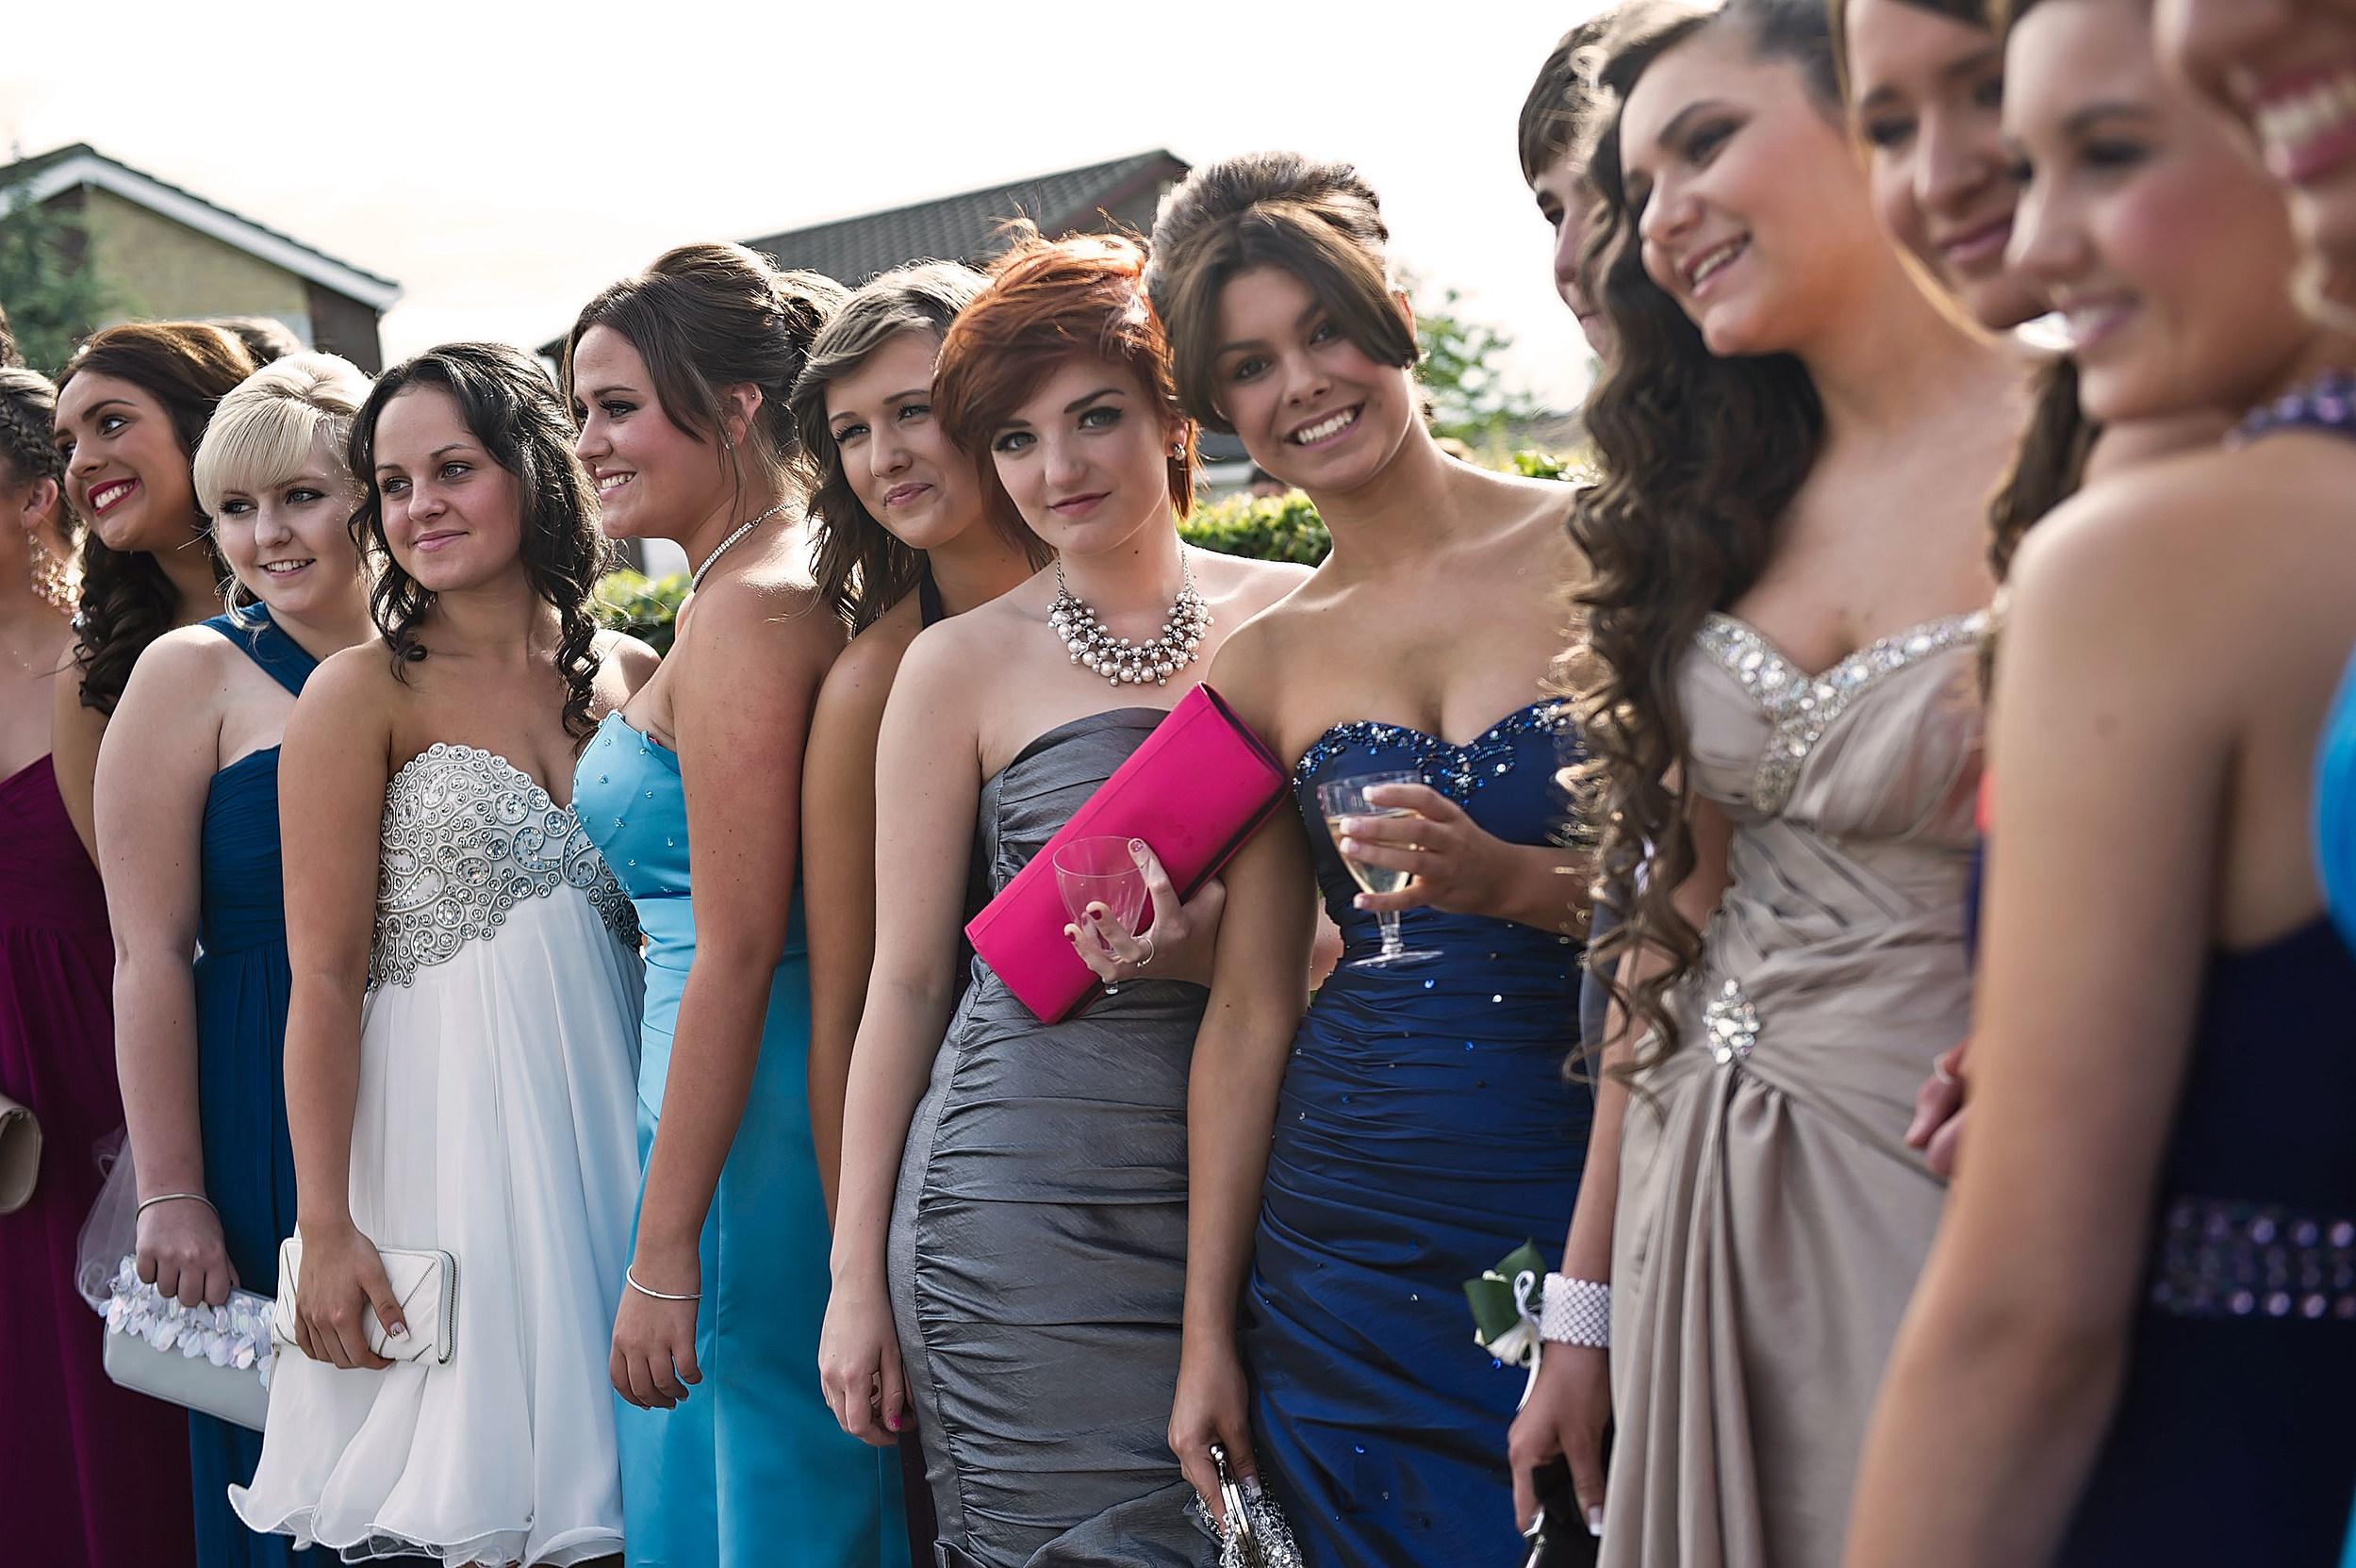 High School Girls Take No Tan For Prom Pledge